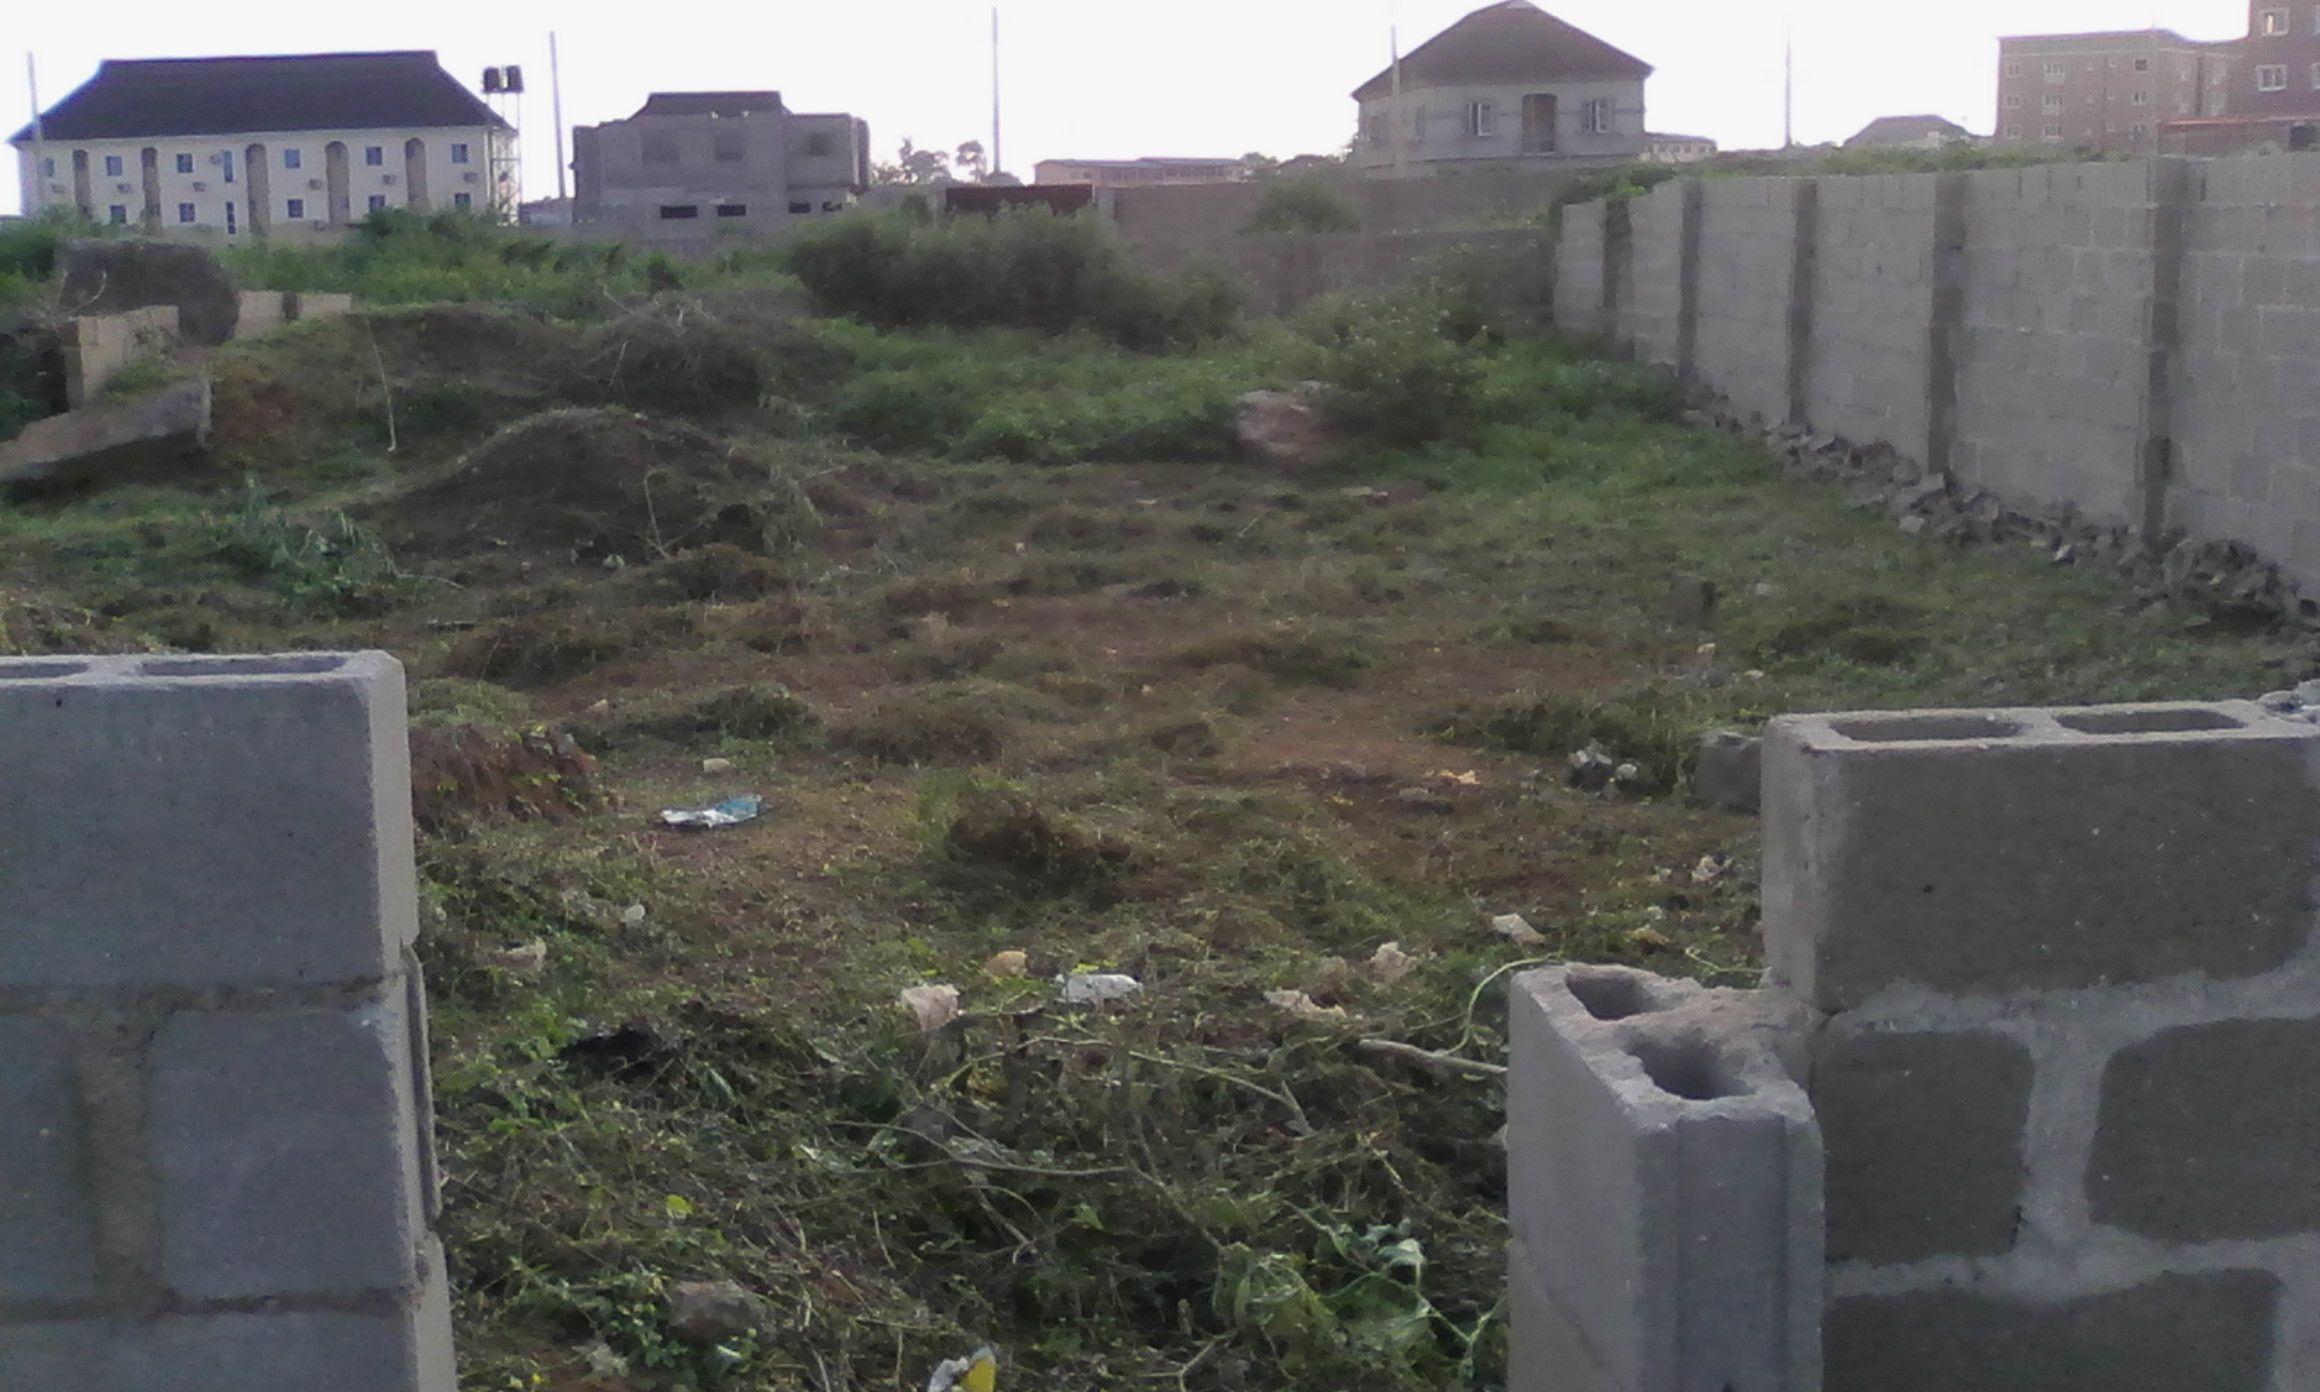 empty plots of land